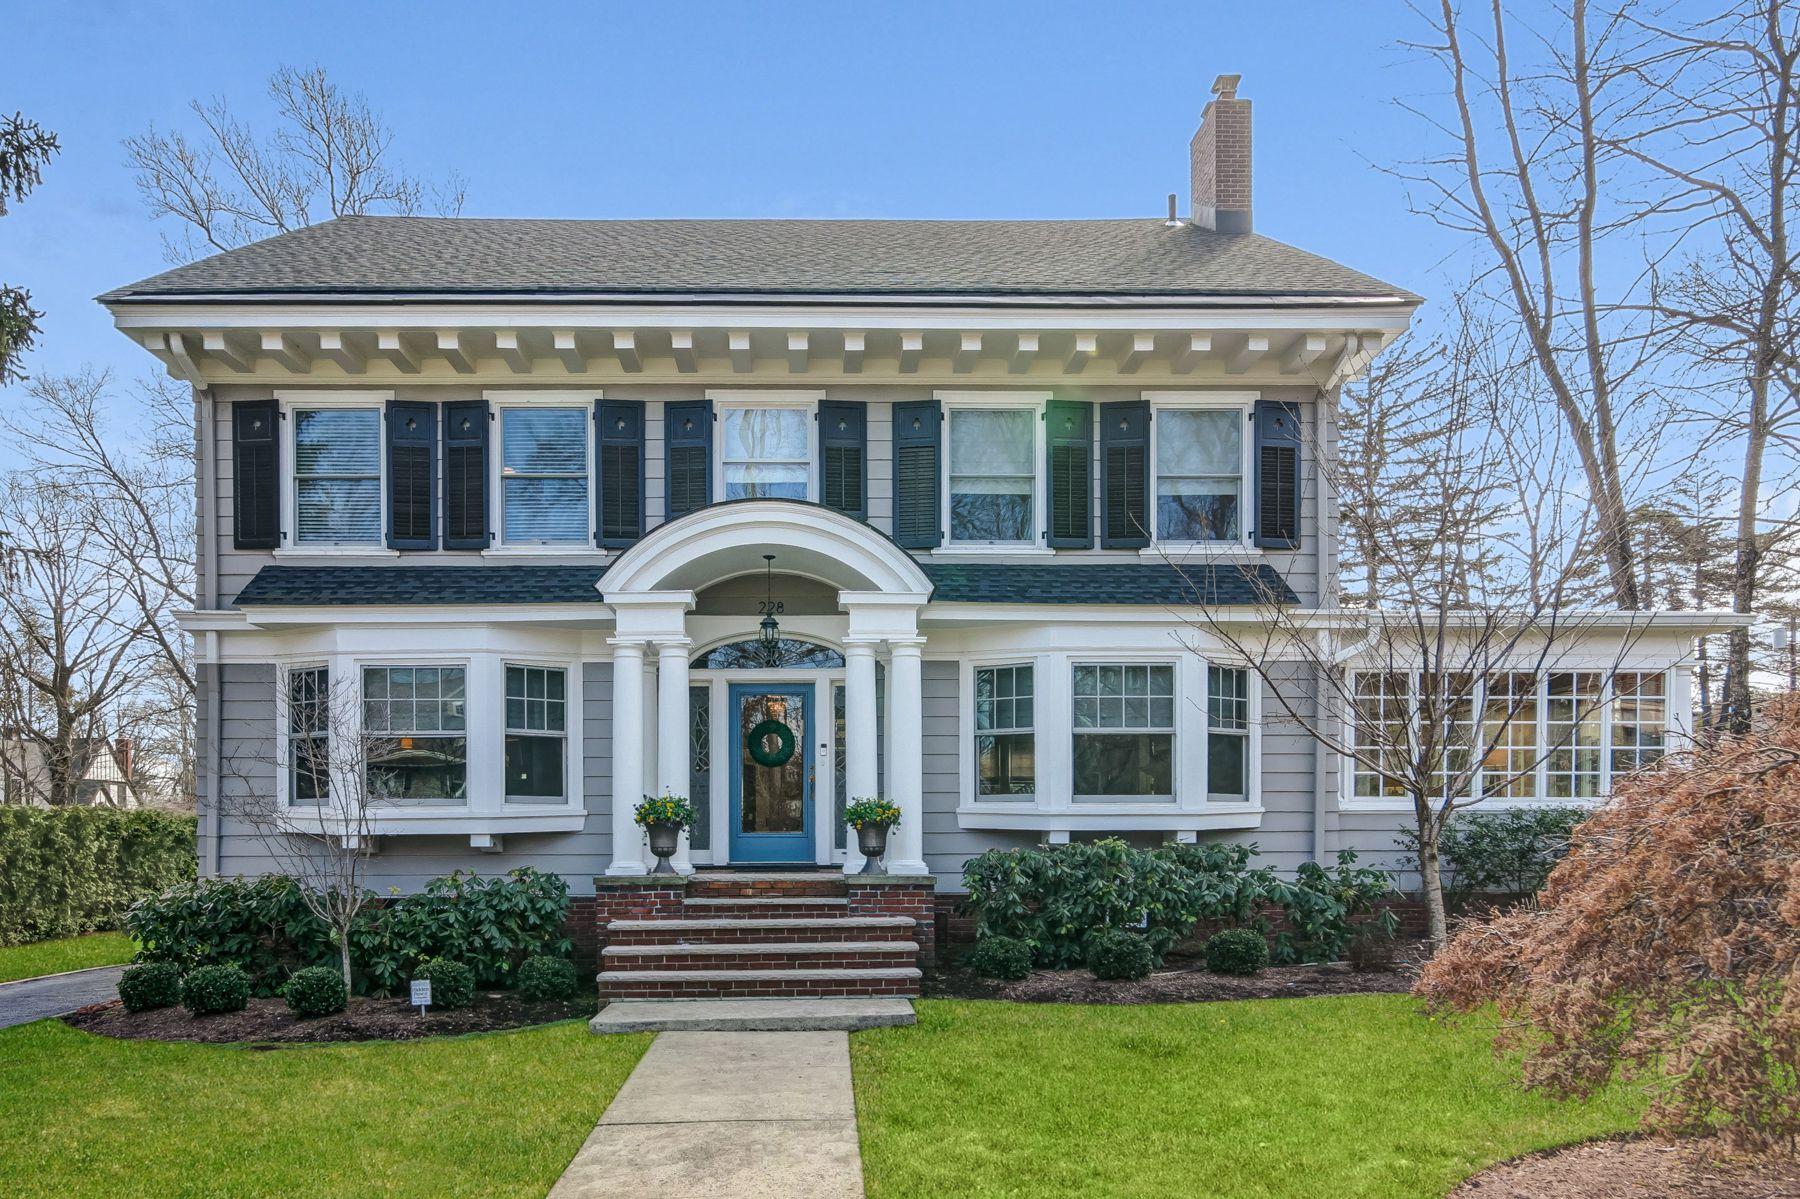 228 Irving Ave, South Orange, NJ 07079 - Estimate and Home Details ...